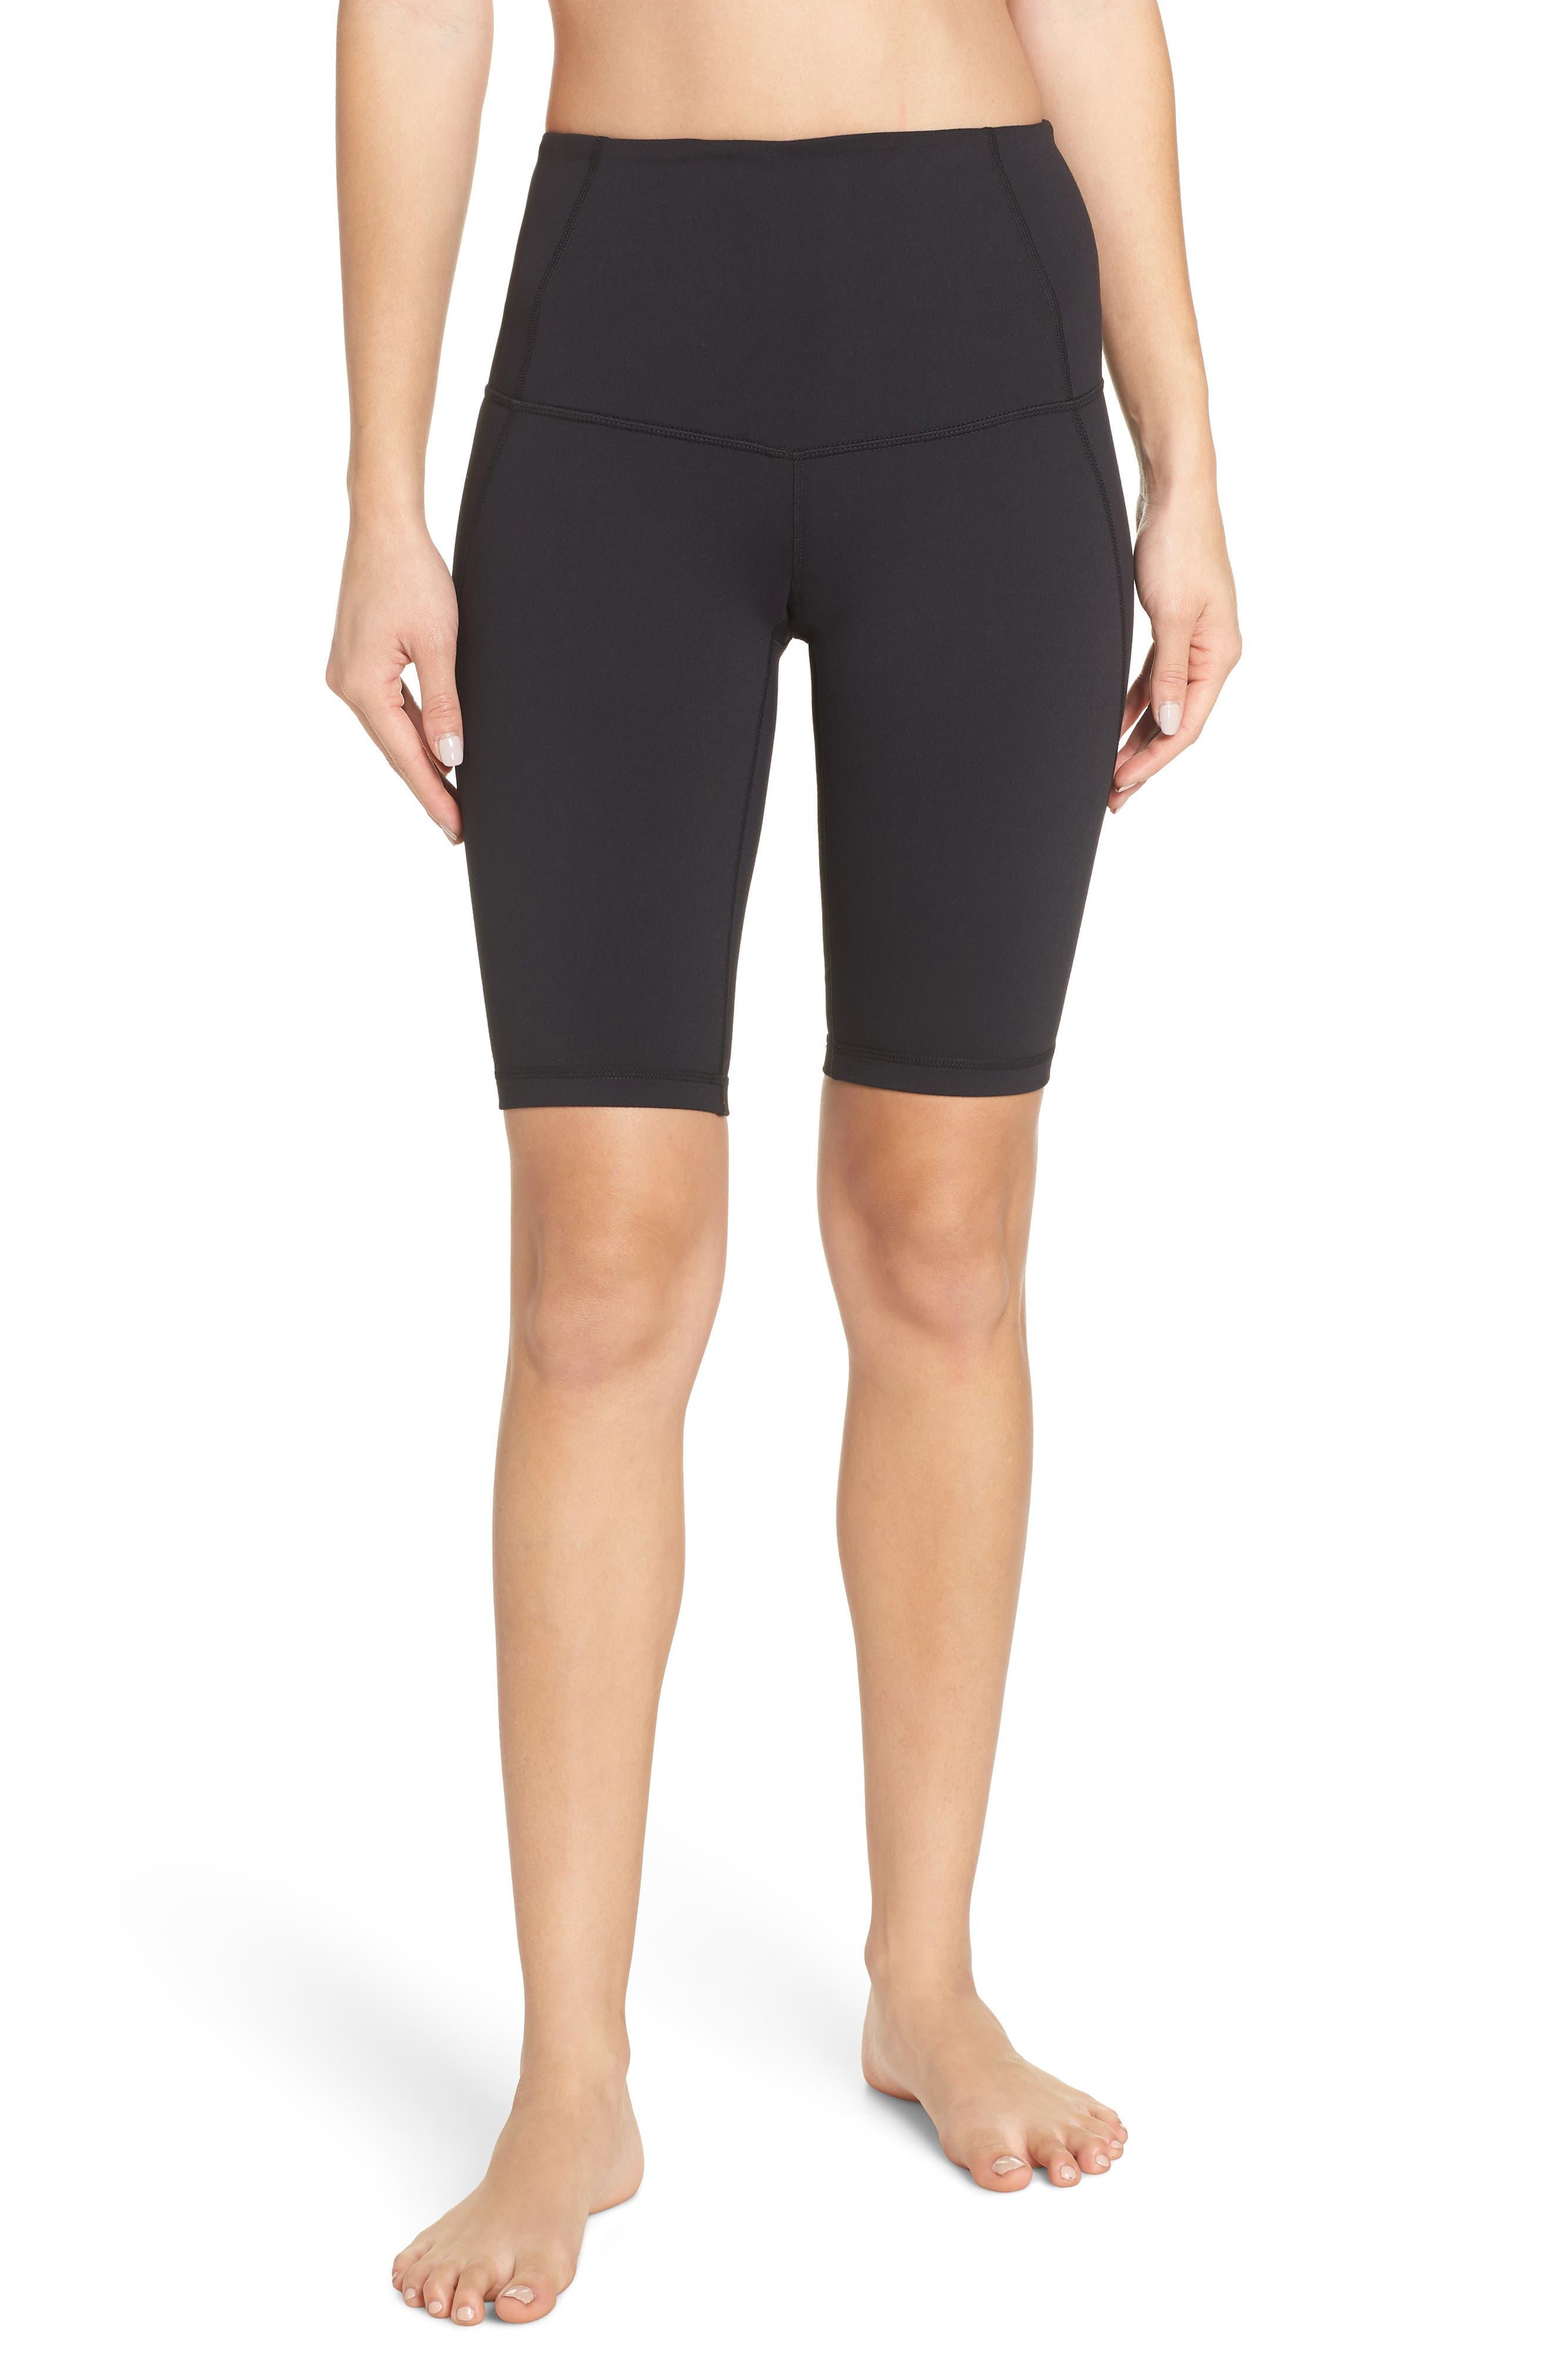 ZELLA, Hatha High Waist Bike Shorts, Main thumbnail 1, color, BLACK